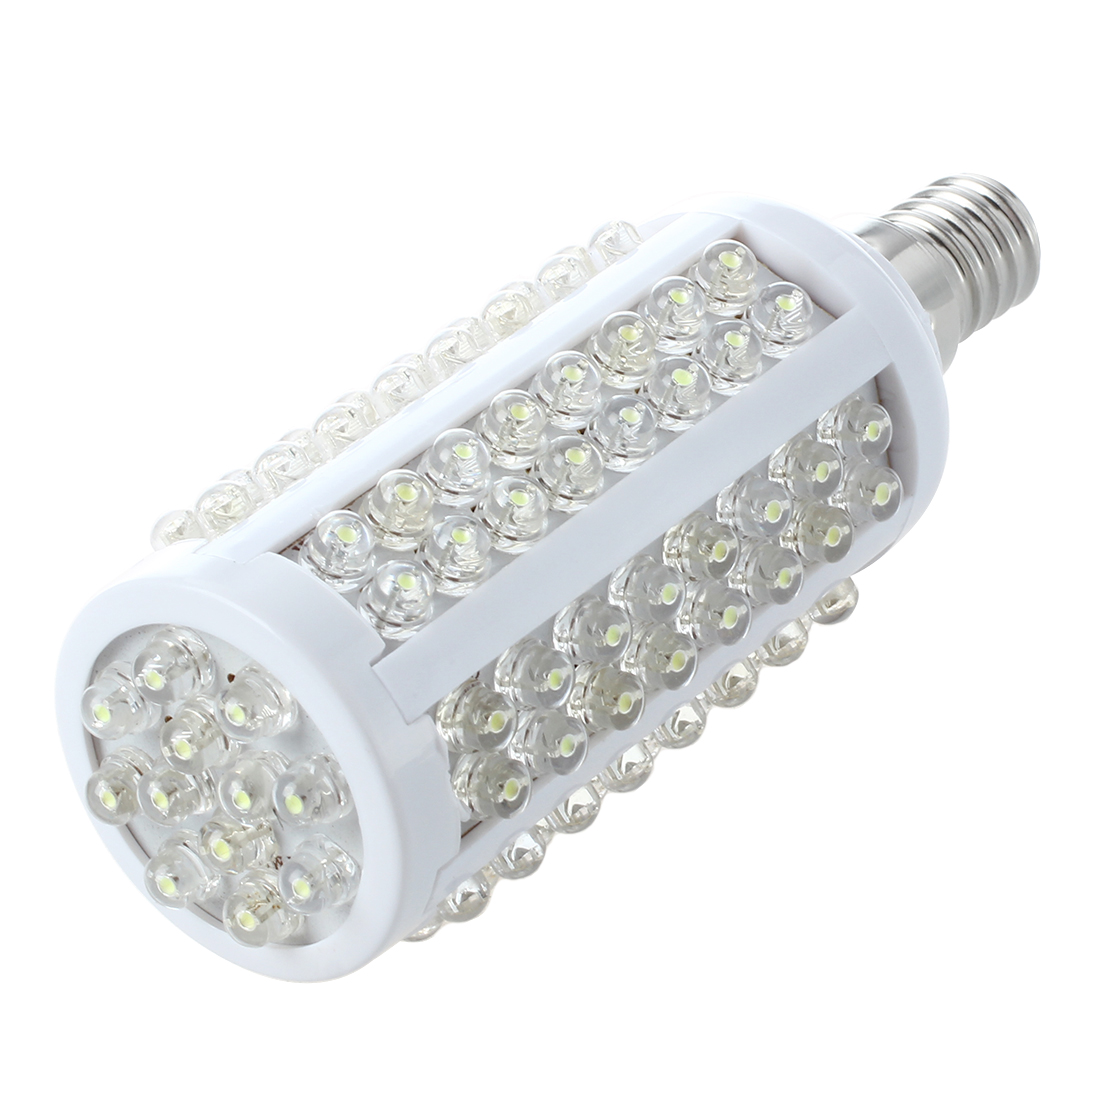 e14 white 108 led corn spot light lamp bulb 7w 500lm energy saving h8h2 ebay. Black Bedroom Furniture Sets. Home Design Ideas